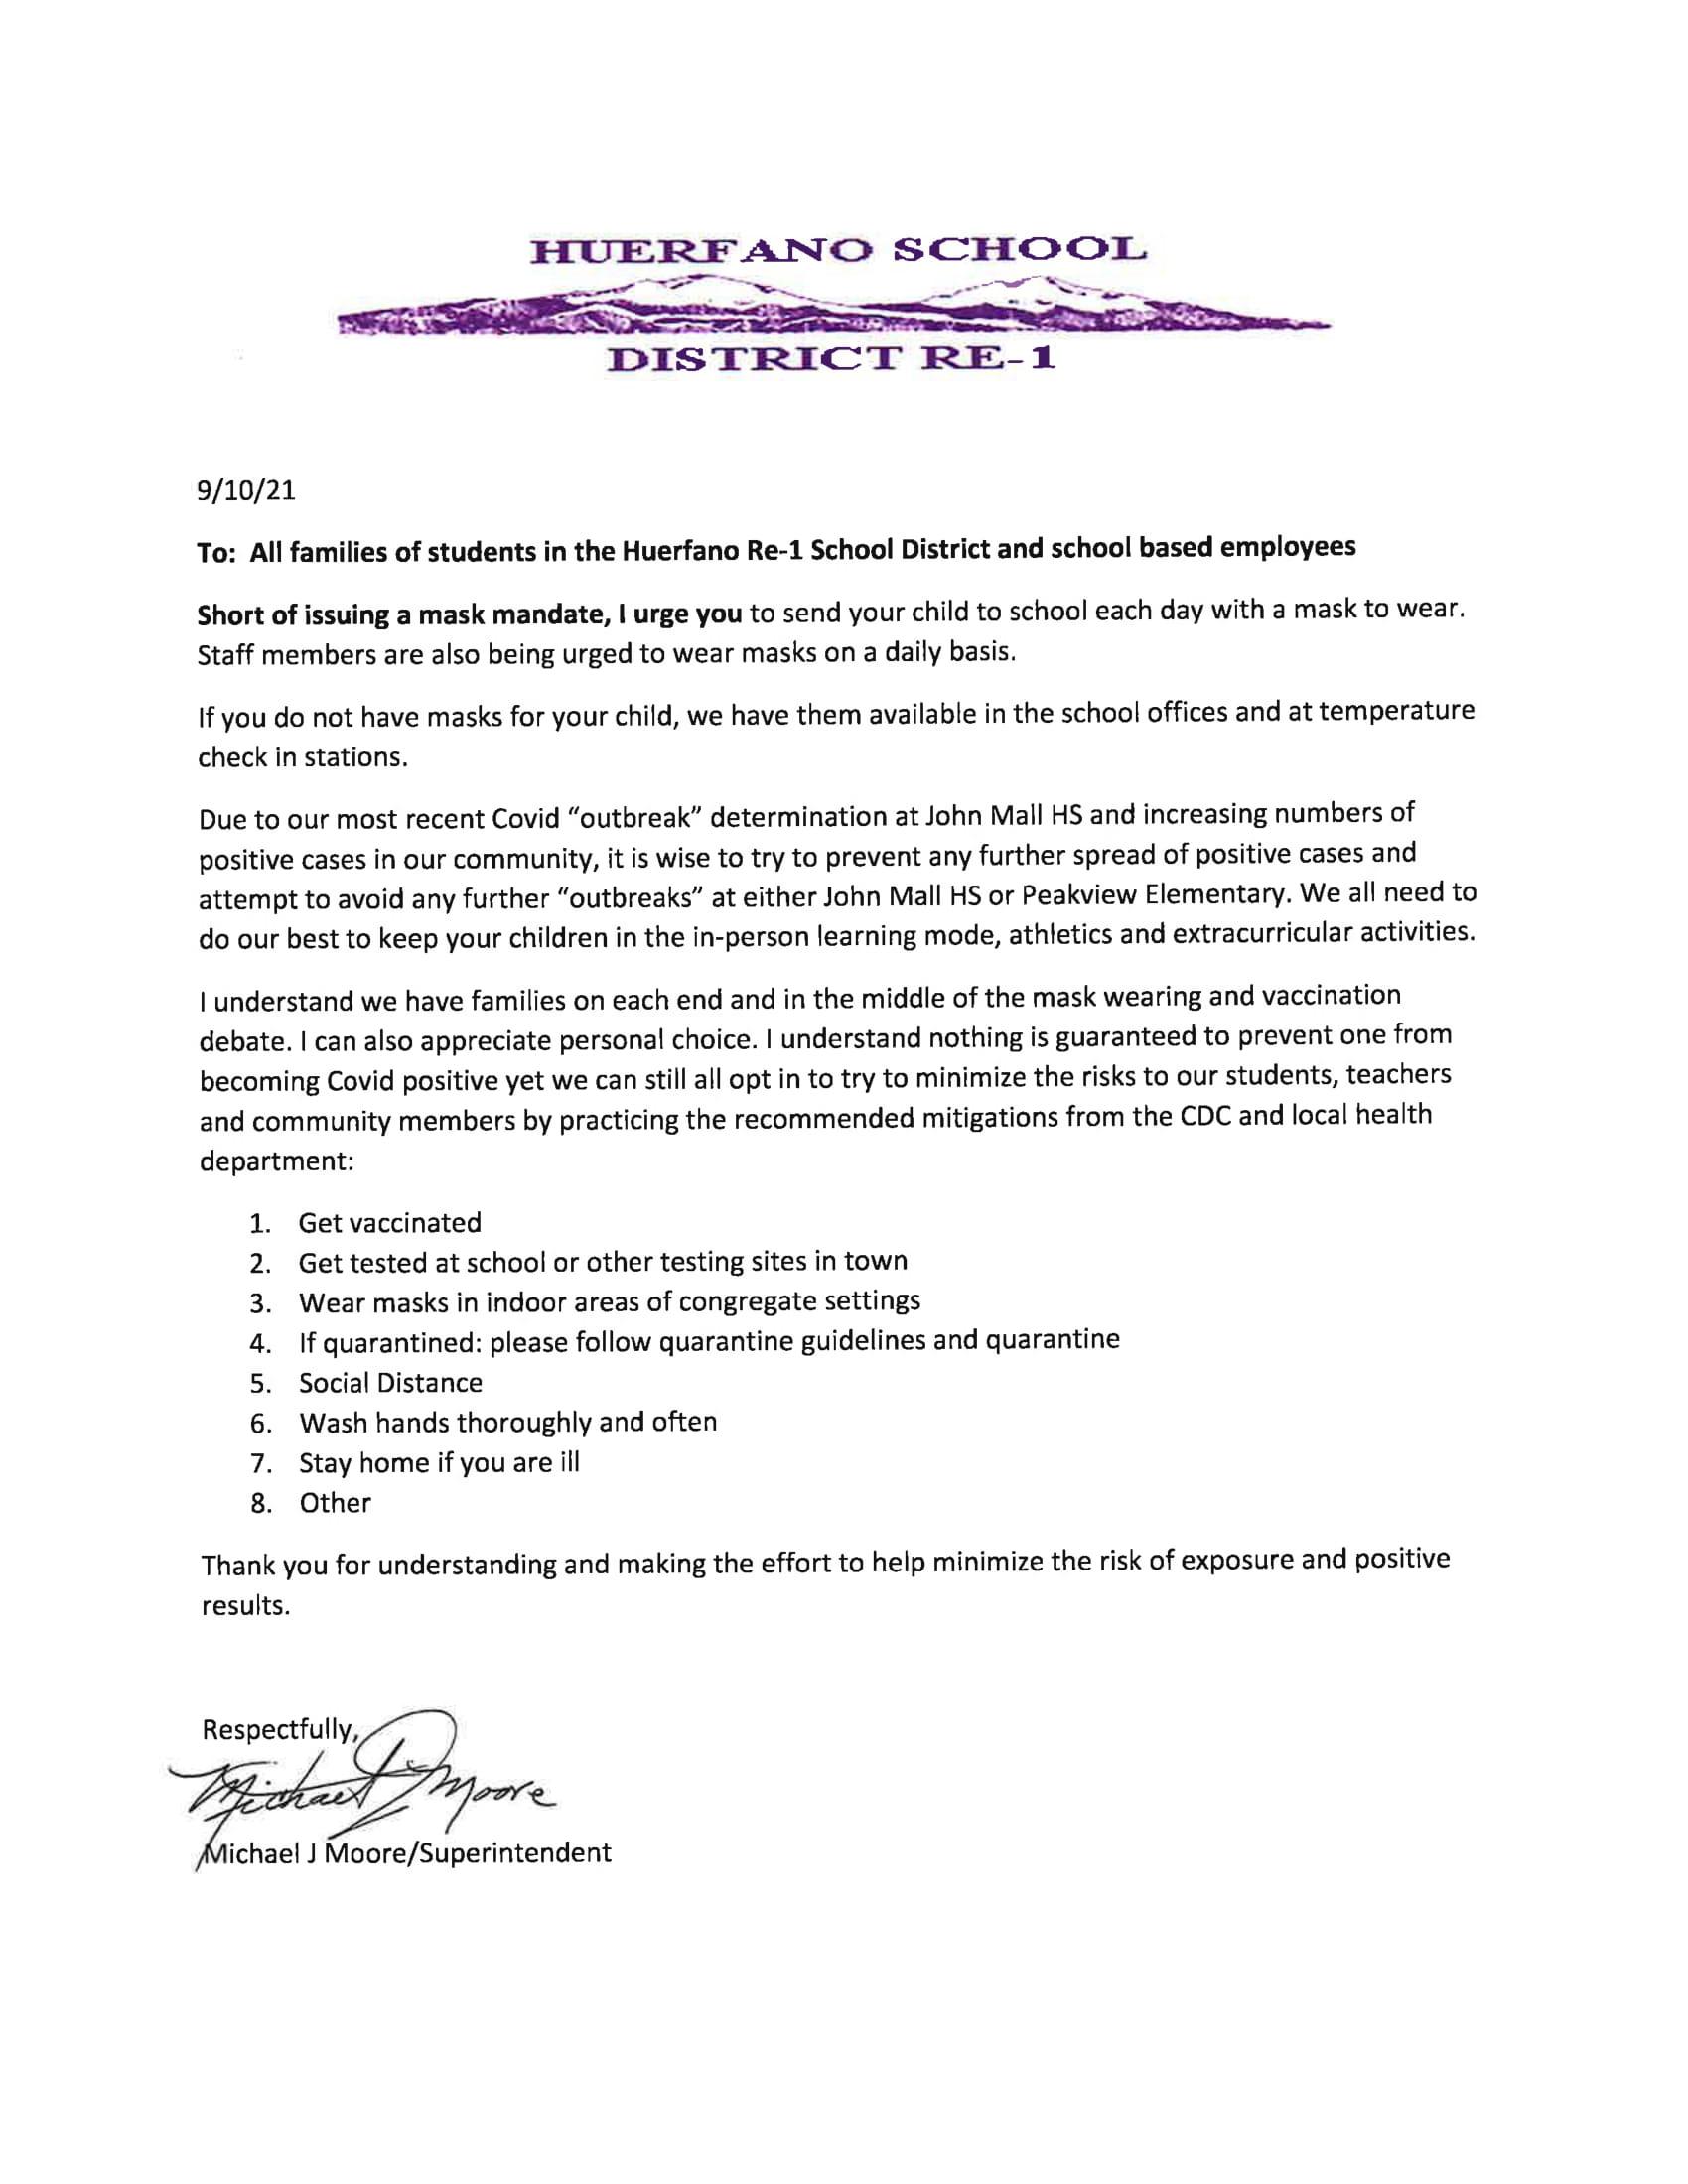 Mask Recommendation Update Letter - 9/10/2021